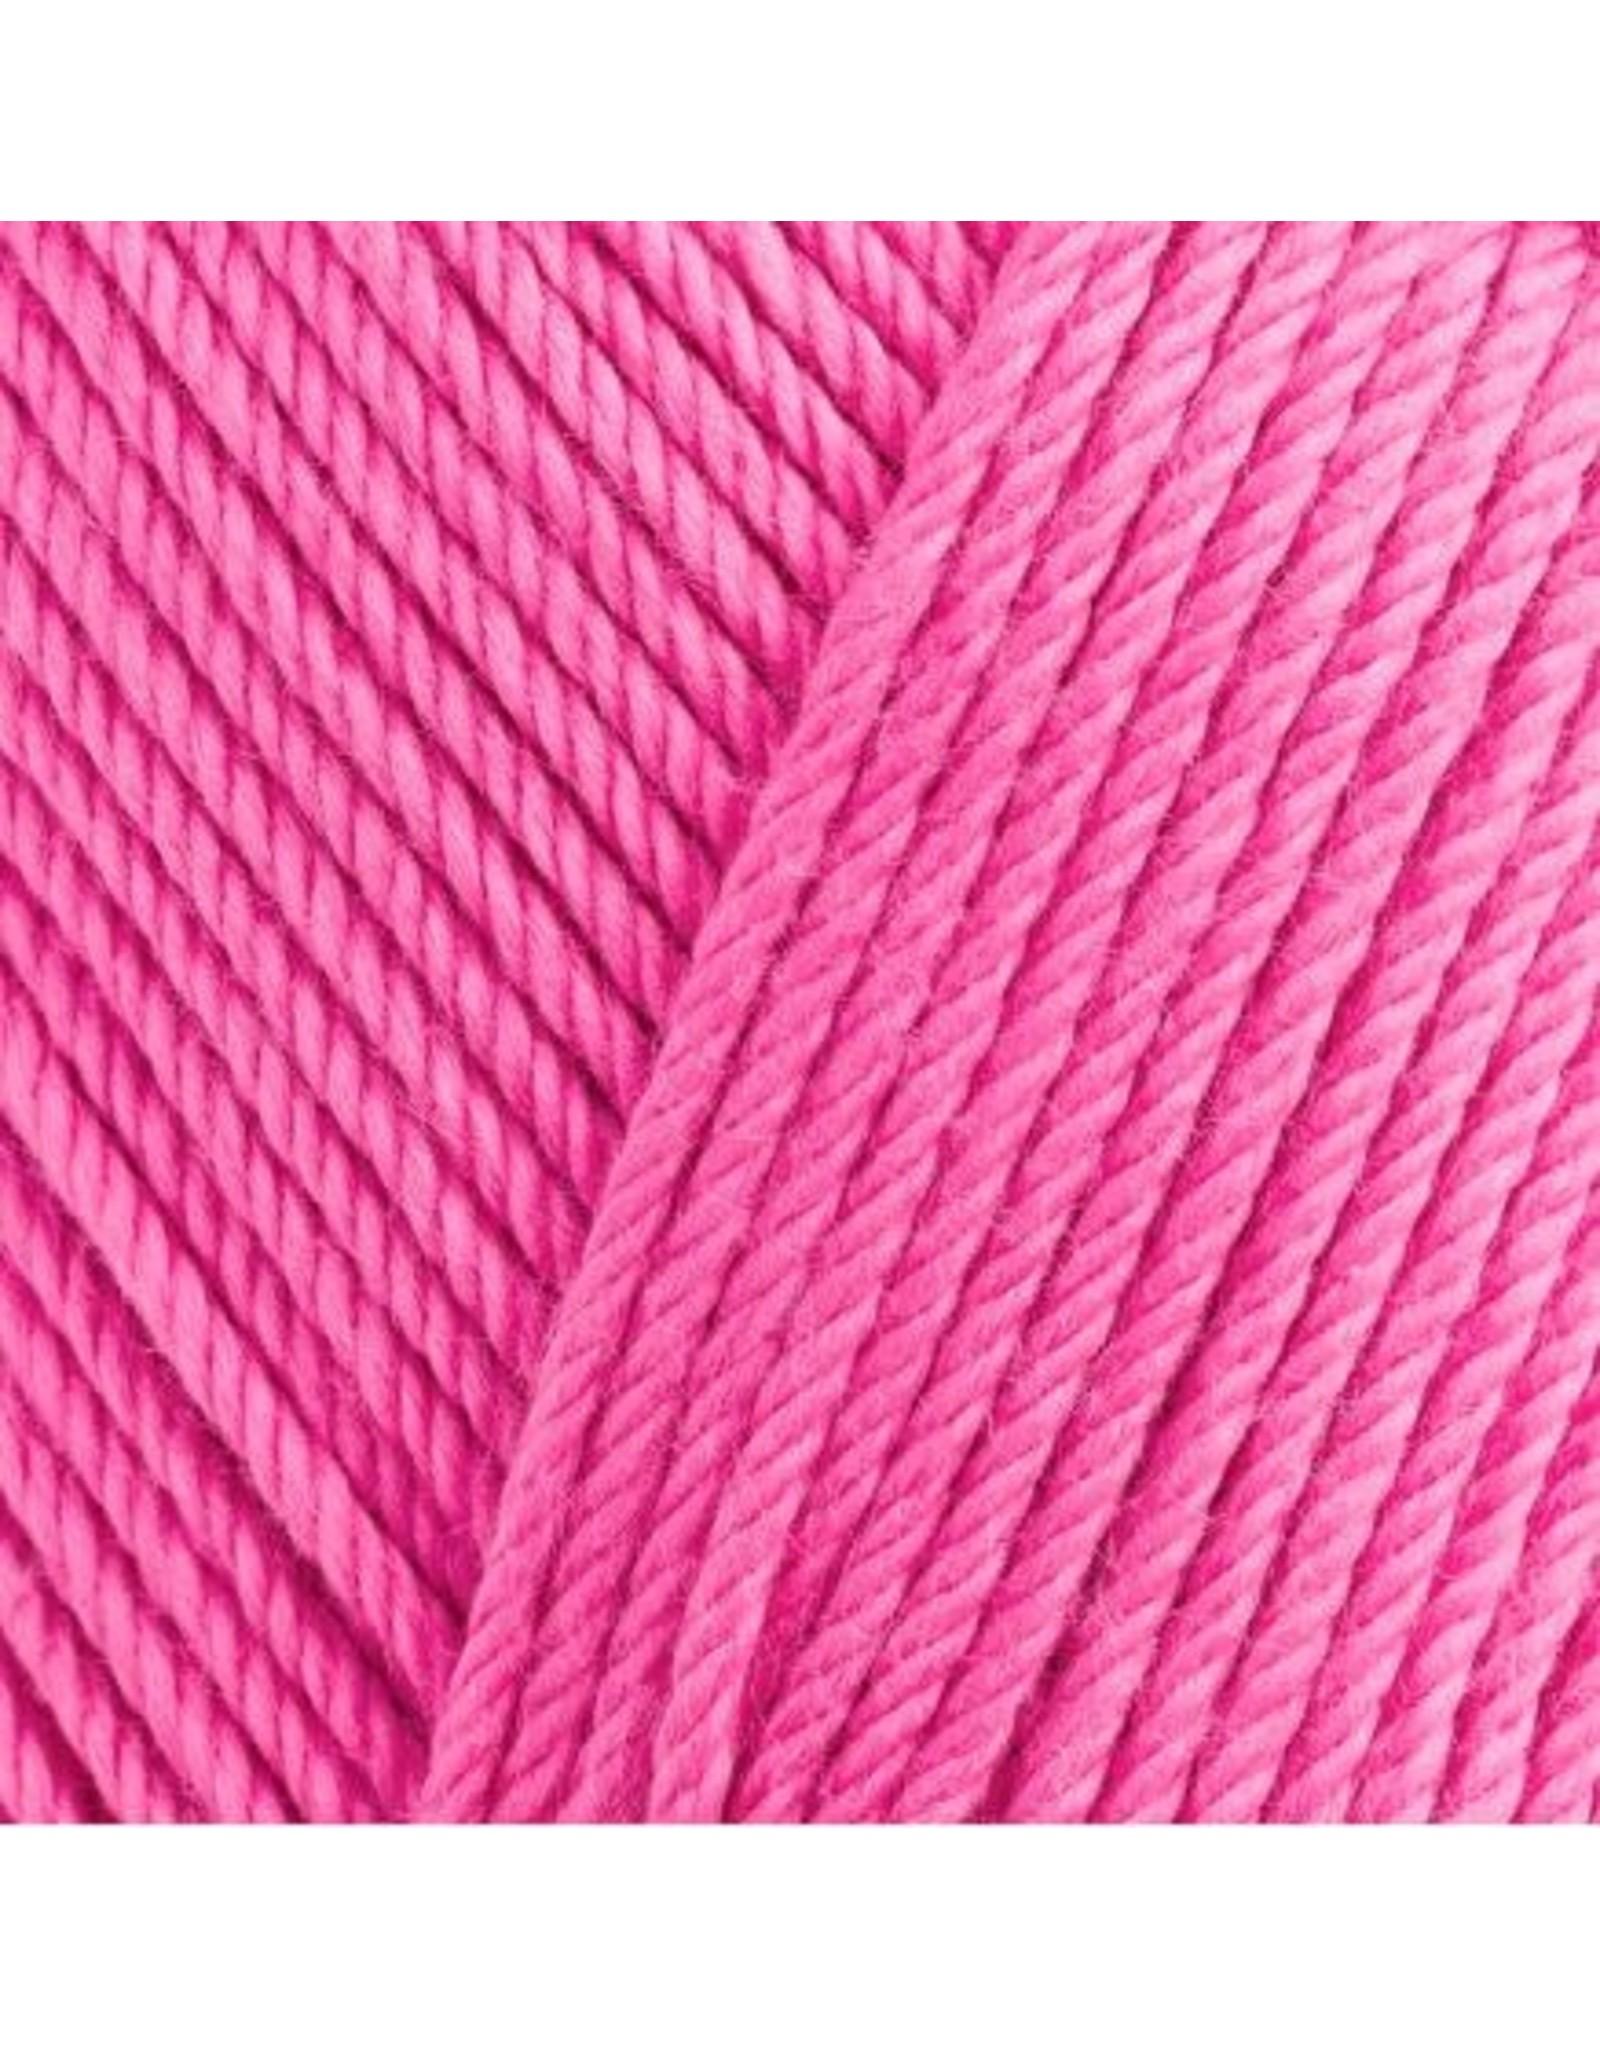 Rowan Rowan: Handknit Cotton,